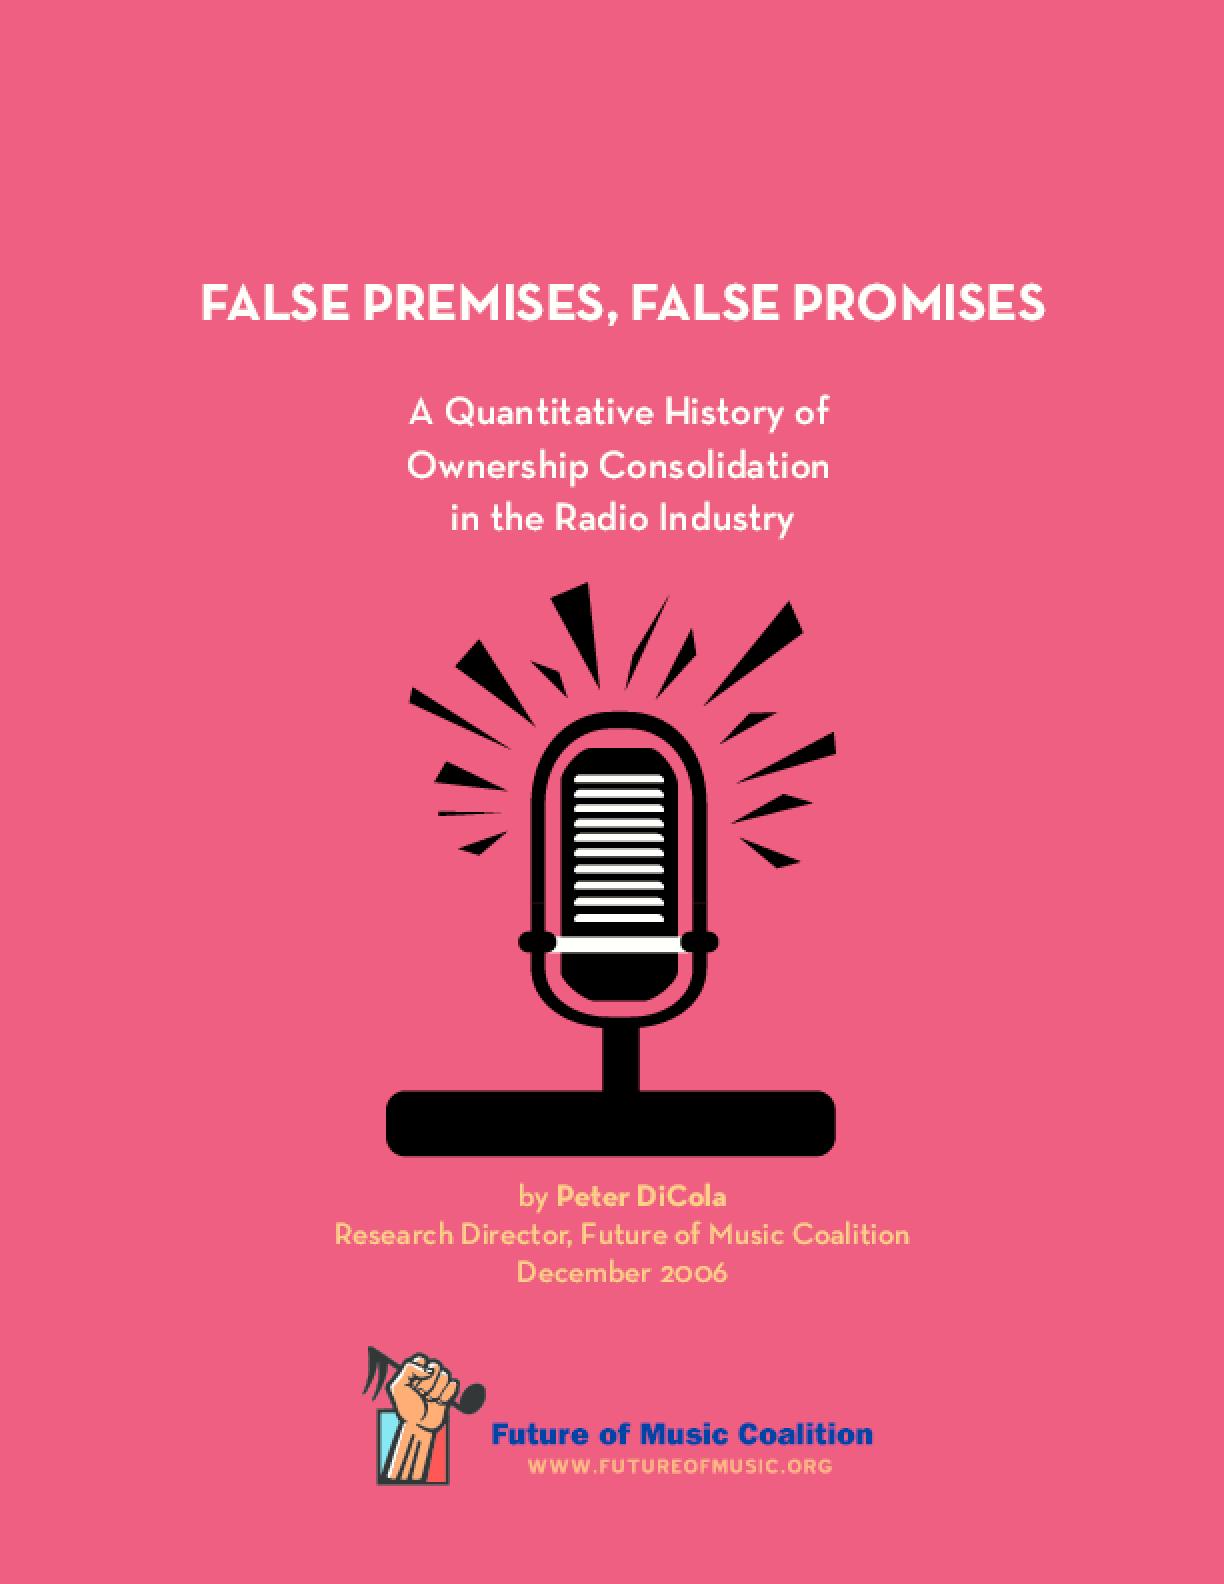 False Premises, False Promises: A Quantitative History of Ownership Consolidation in the Radio Industry